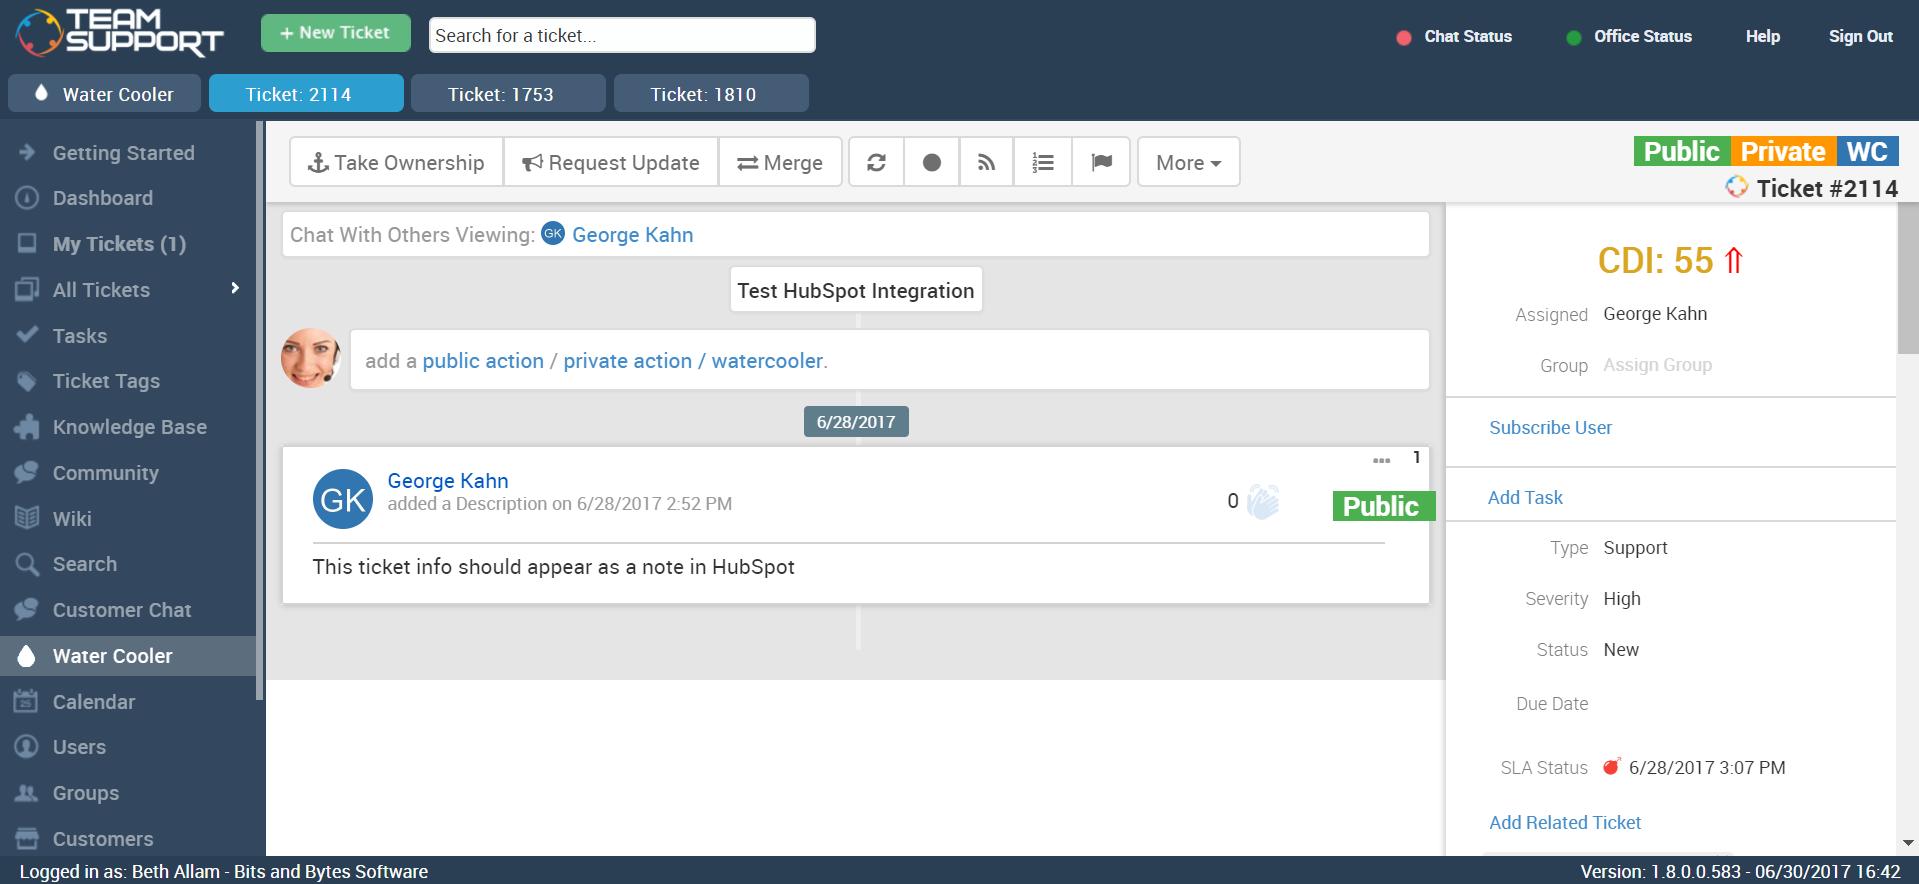 TeamSupport Software - 10